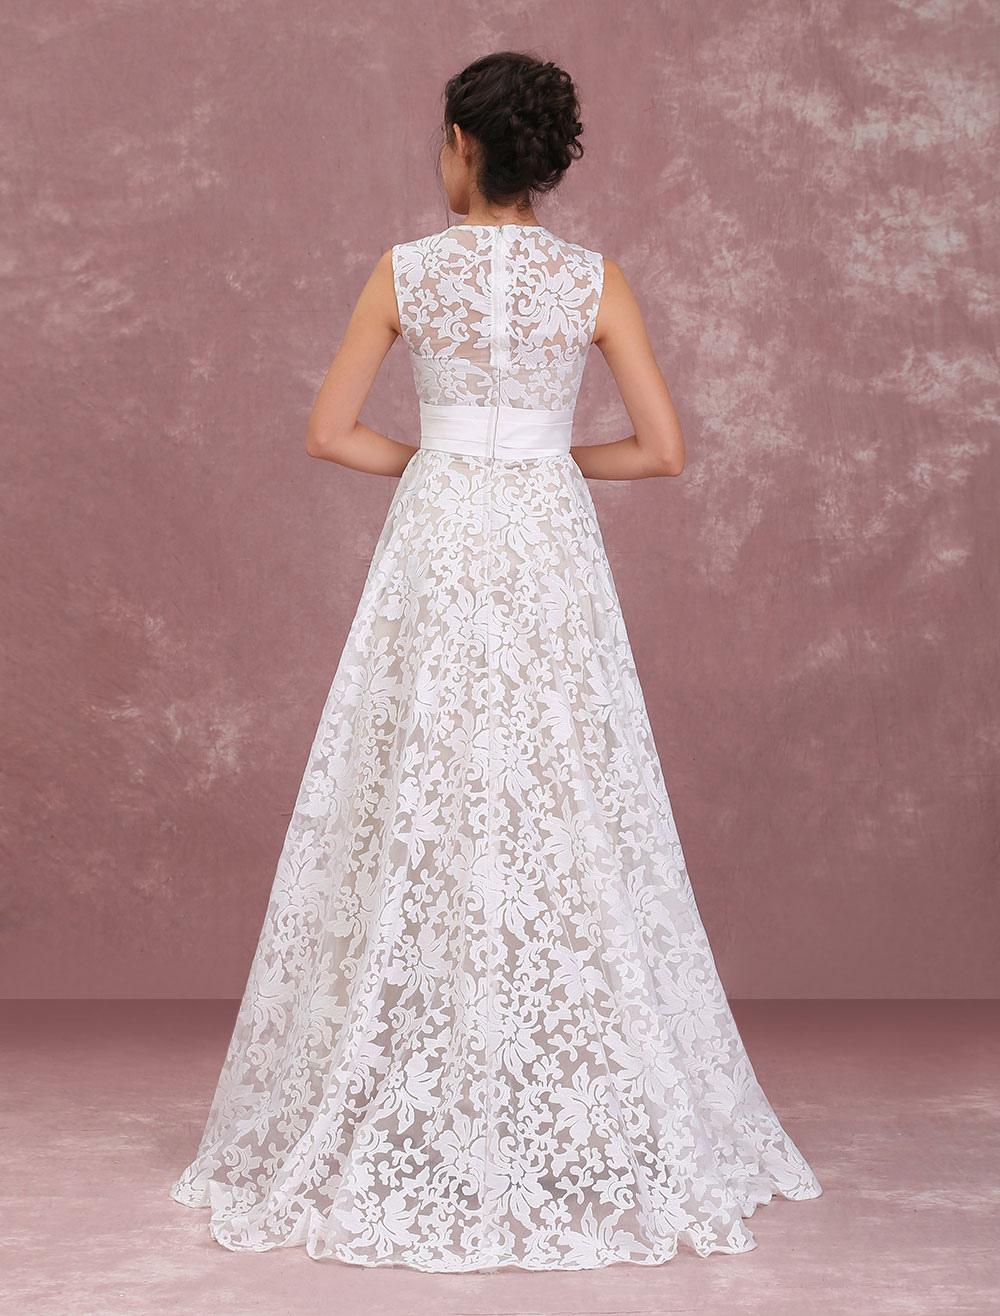 295be79b81 ... Champagne Wedding Dresses Lace High Low Beach Bridal Dress Pleated Sash  Asymmetrical Wedding Gown-No ...